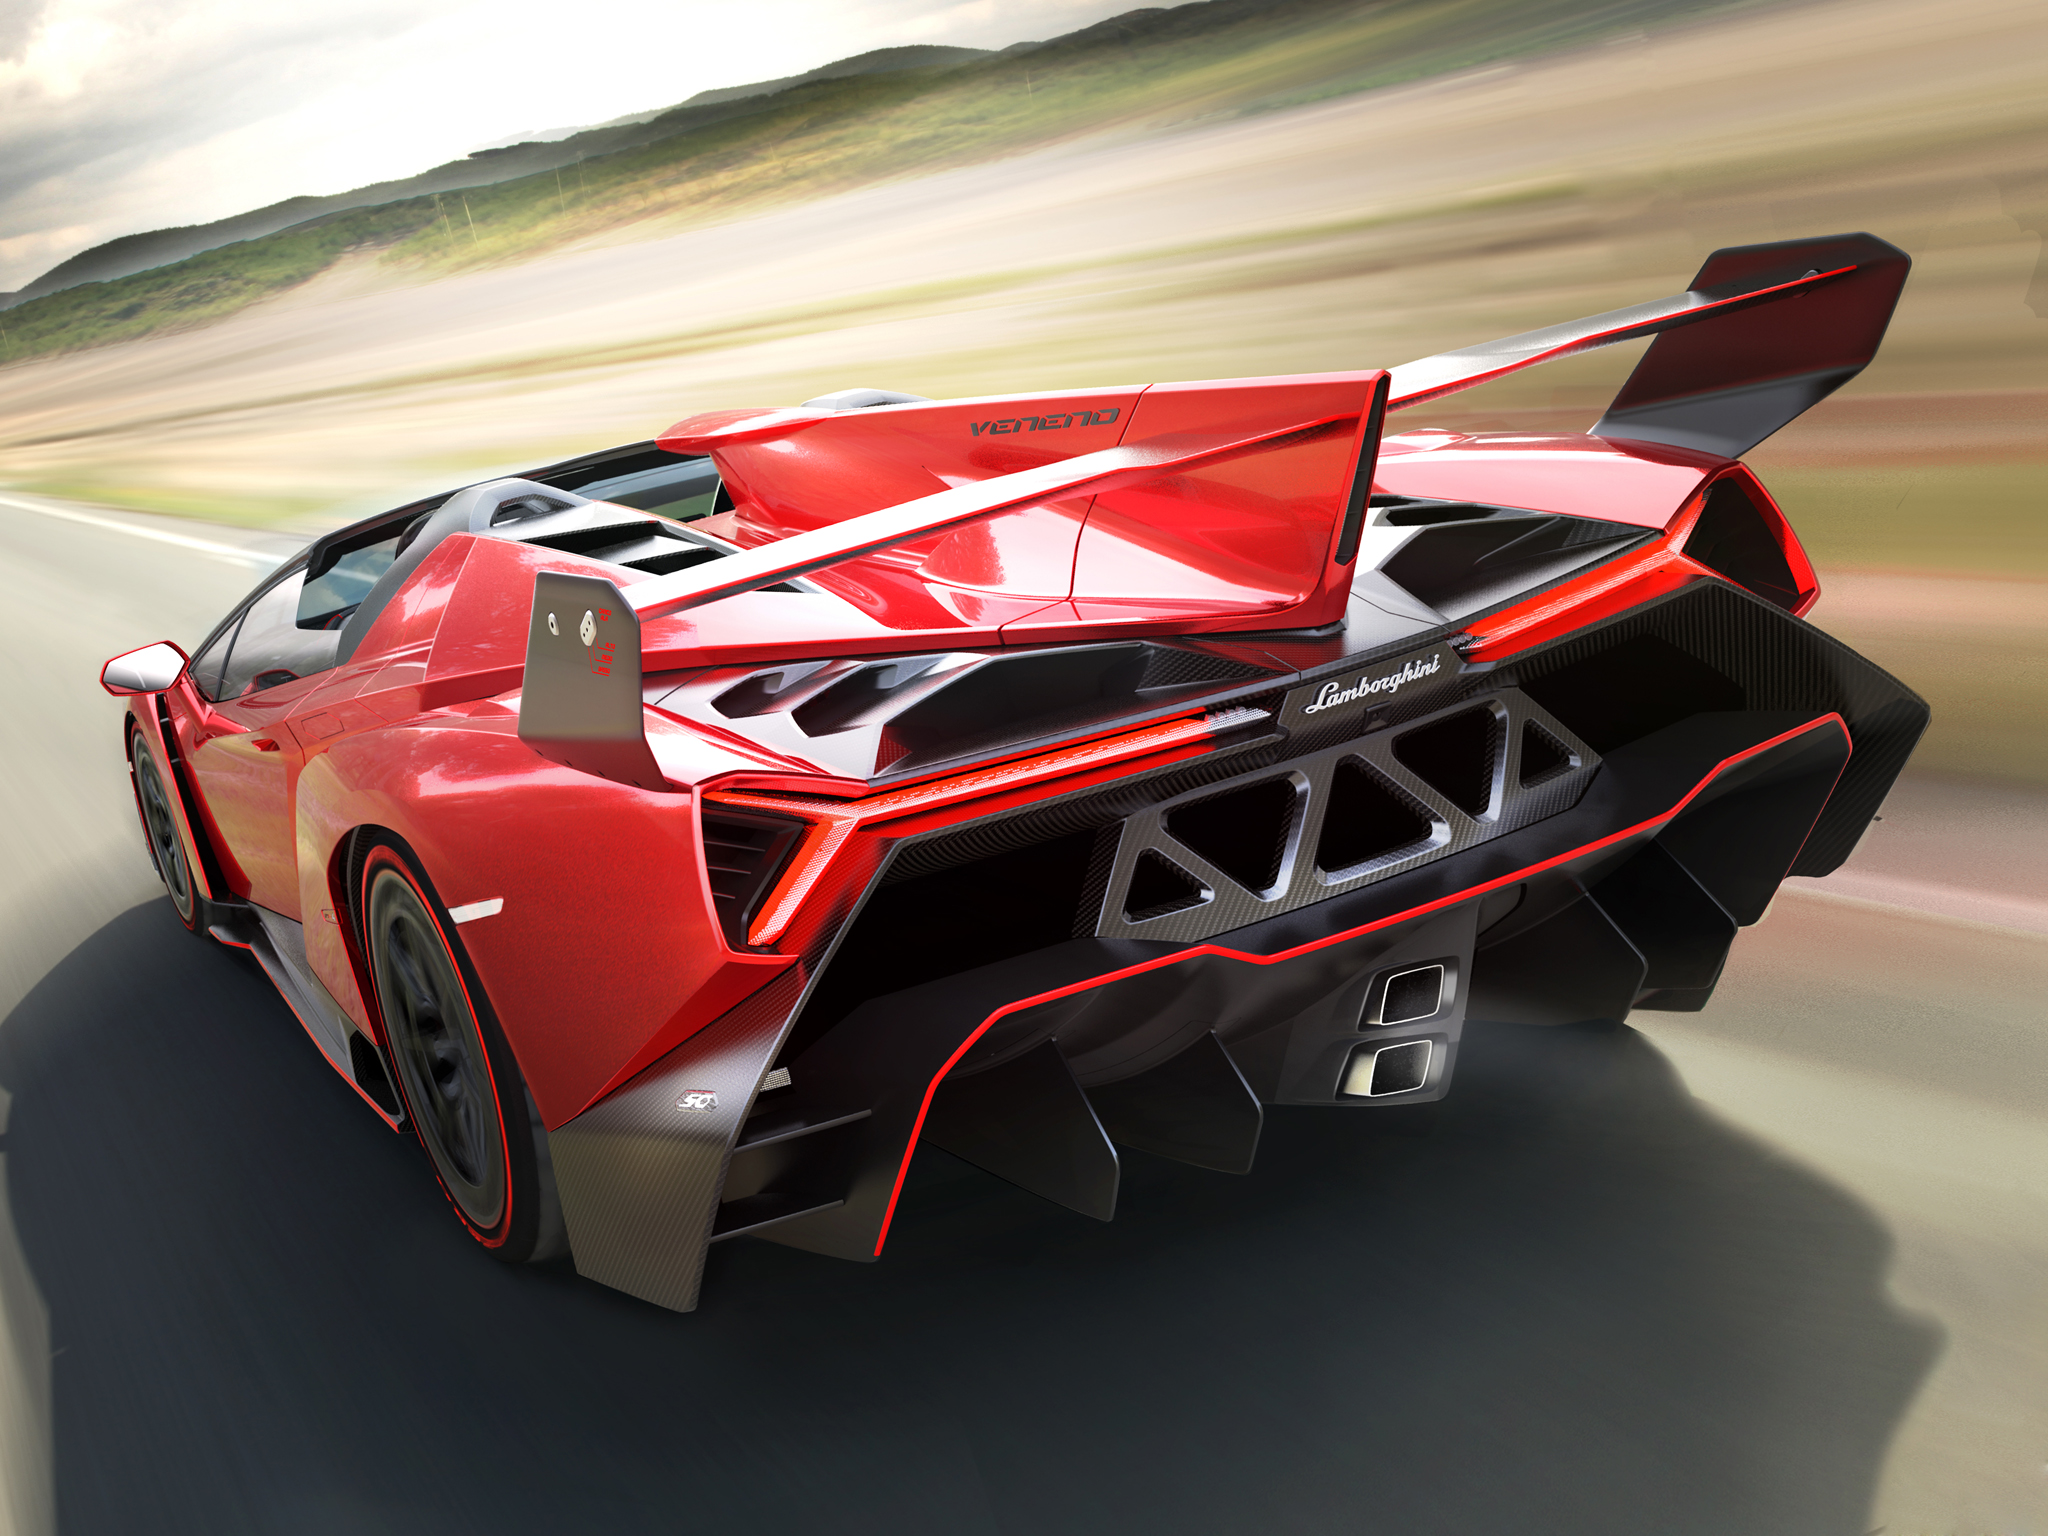 2014 lamborghini veneno roadster supercar f wallpaper 2048x1536 162624 wallpaperup - Lamborghini Veneno Roadster Iphone Wallpaper